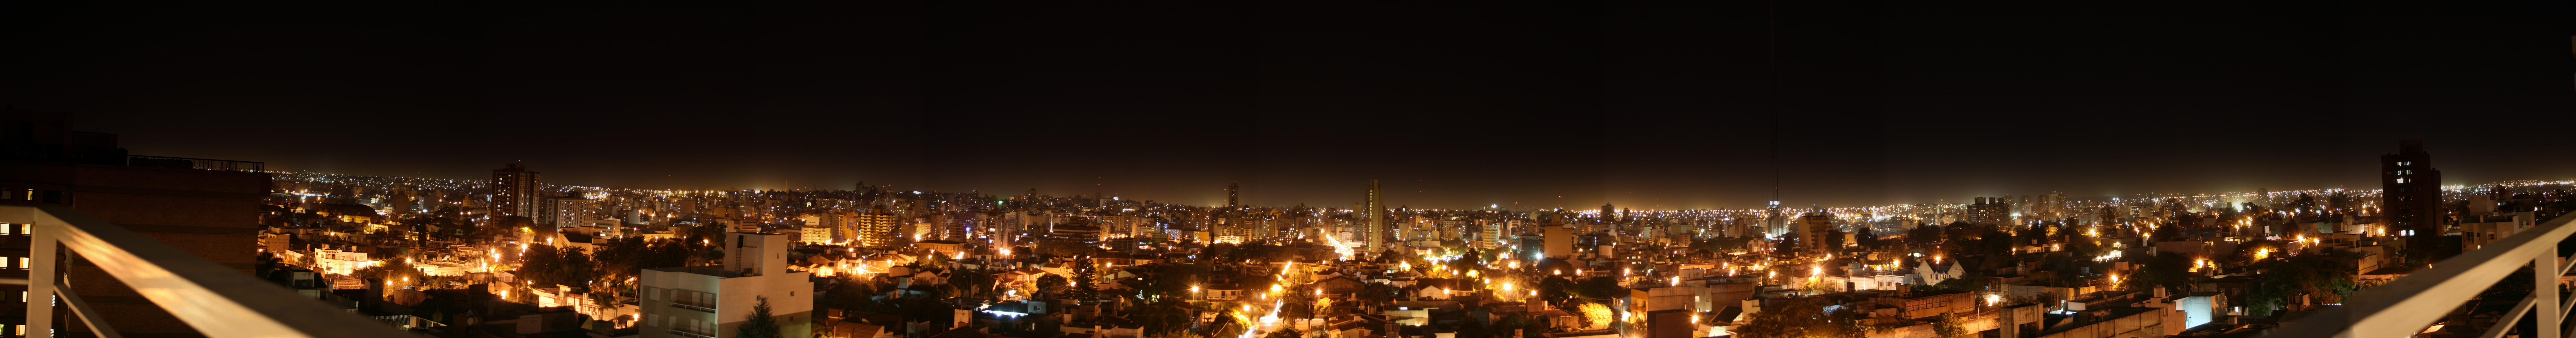 Muéstranos tu Ciudad/Pueblo o País Panoramic_photo_of_Cordoba%2C_Argentina